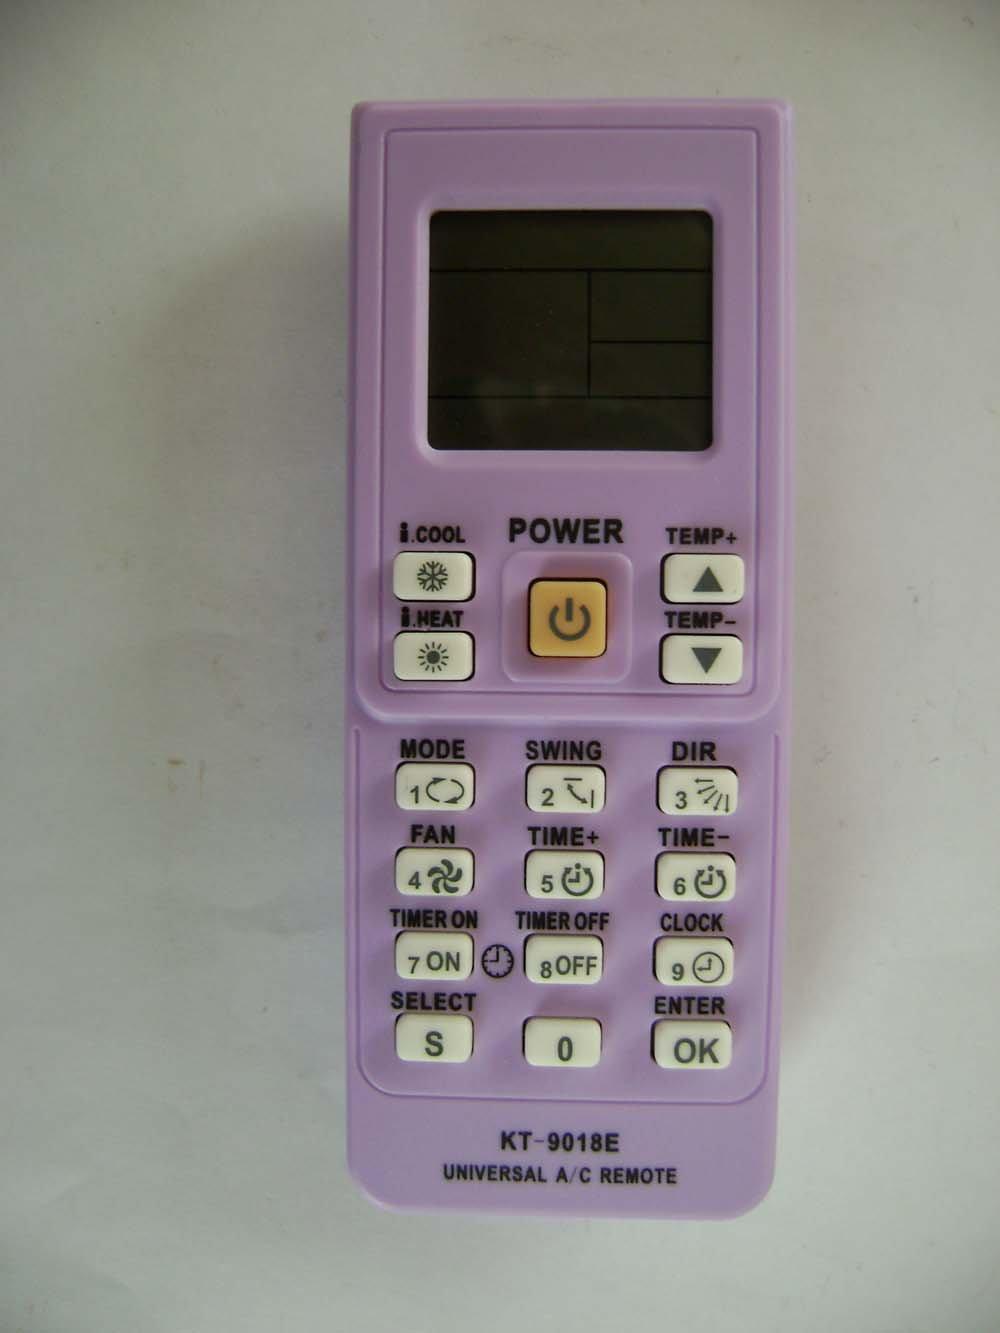 KT-9018E: 4000 codes in 1 A/C universal remote